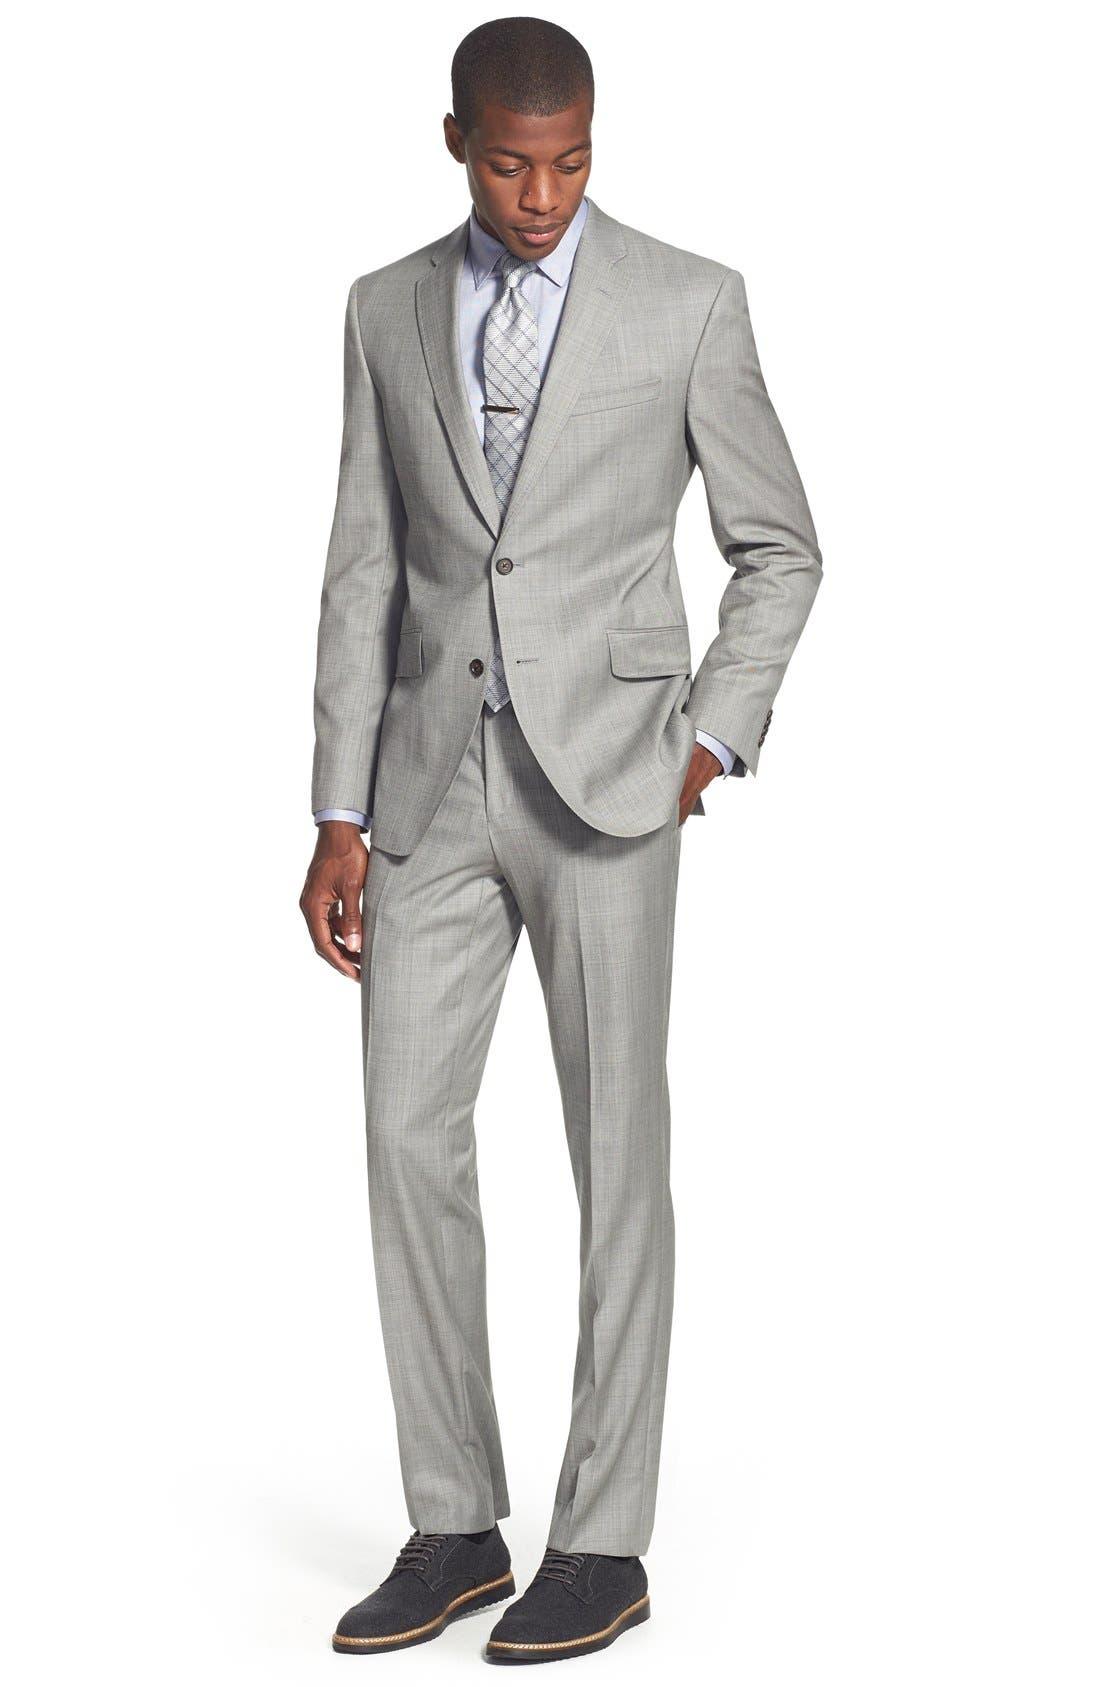 Jones Trim Fit Wool Suit,                             Alternate thumbnail 9, color,                             Medium Grey